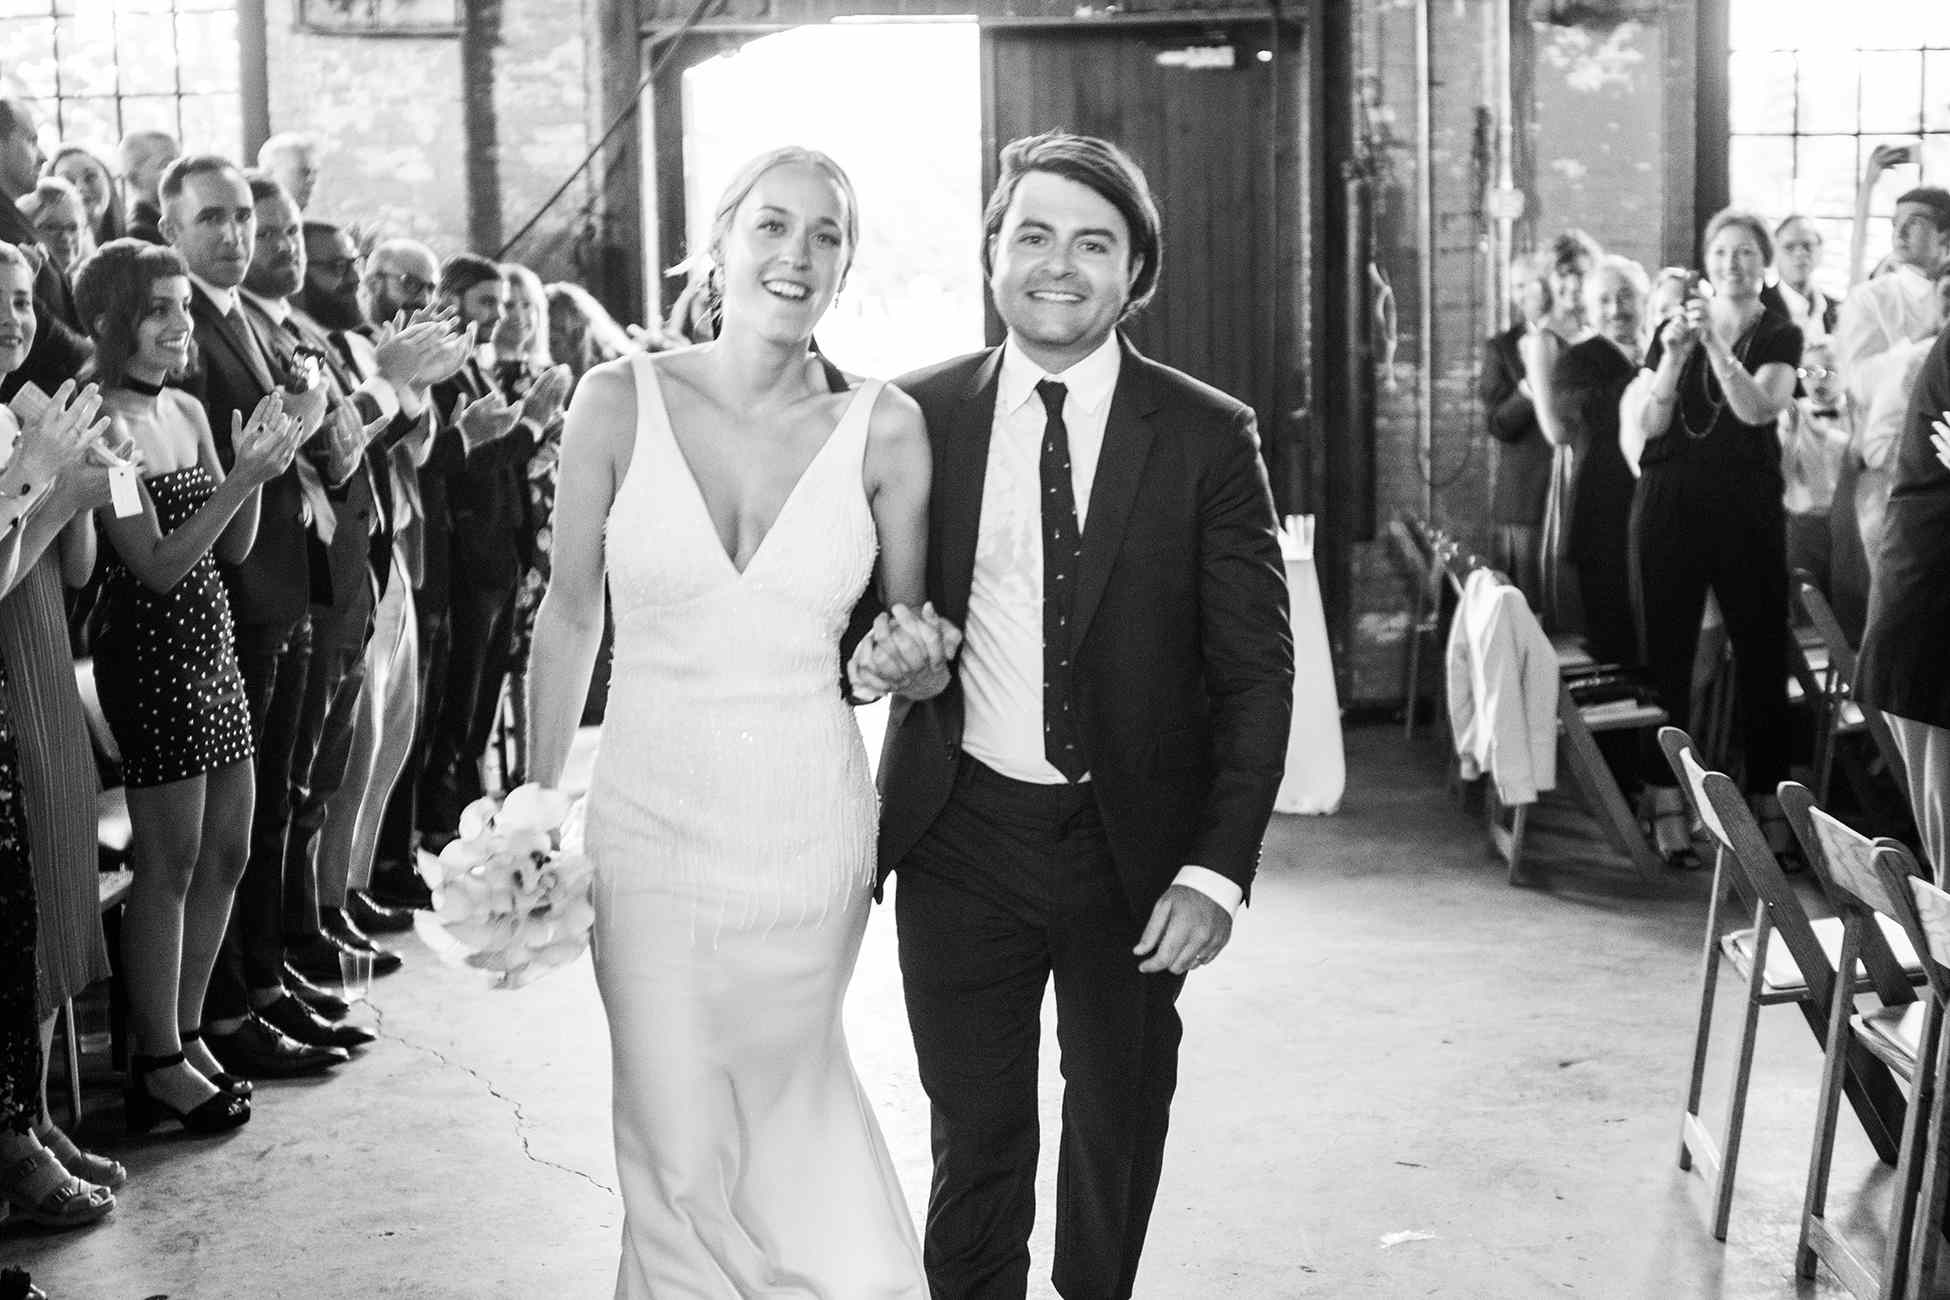 <p>bride and groom ceremony exit</p><br><br>